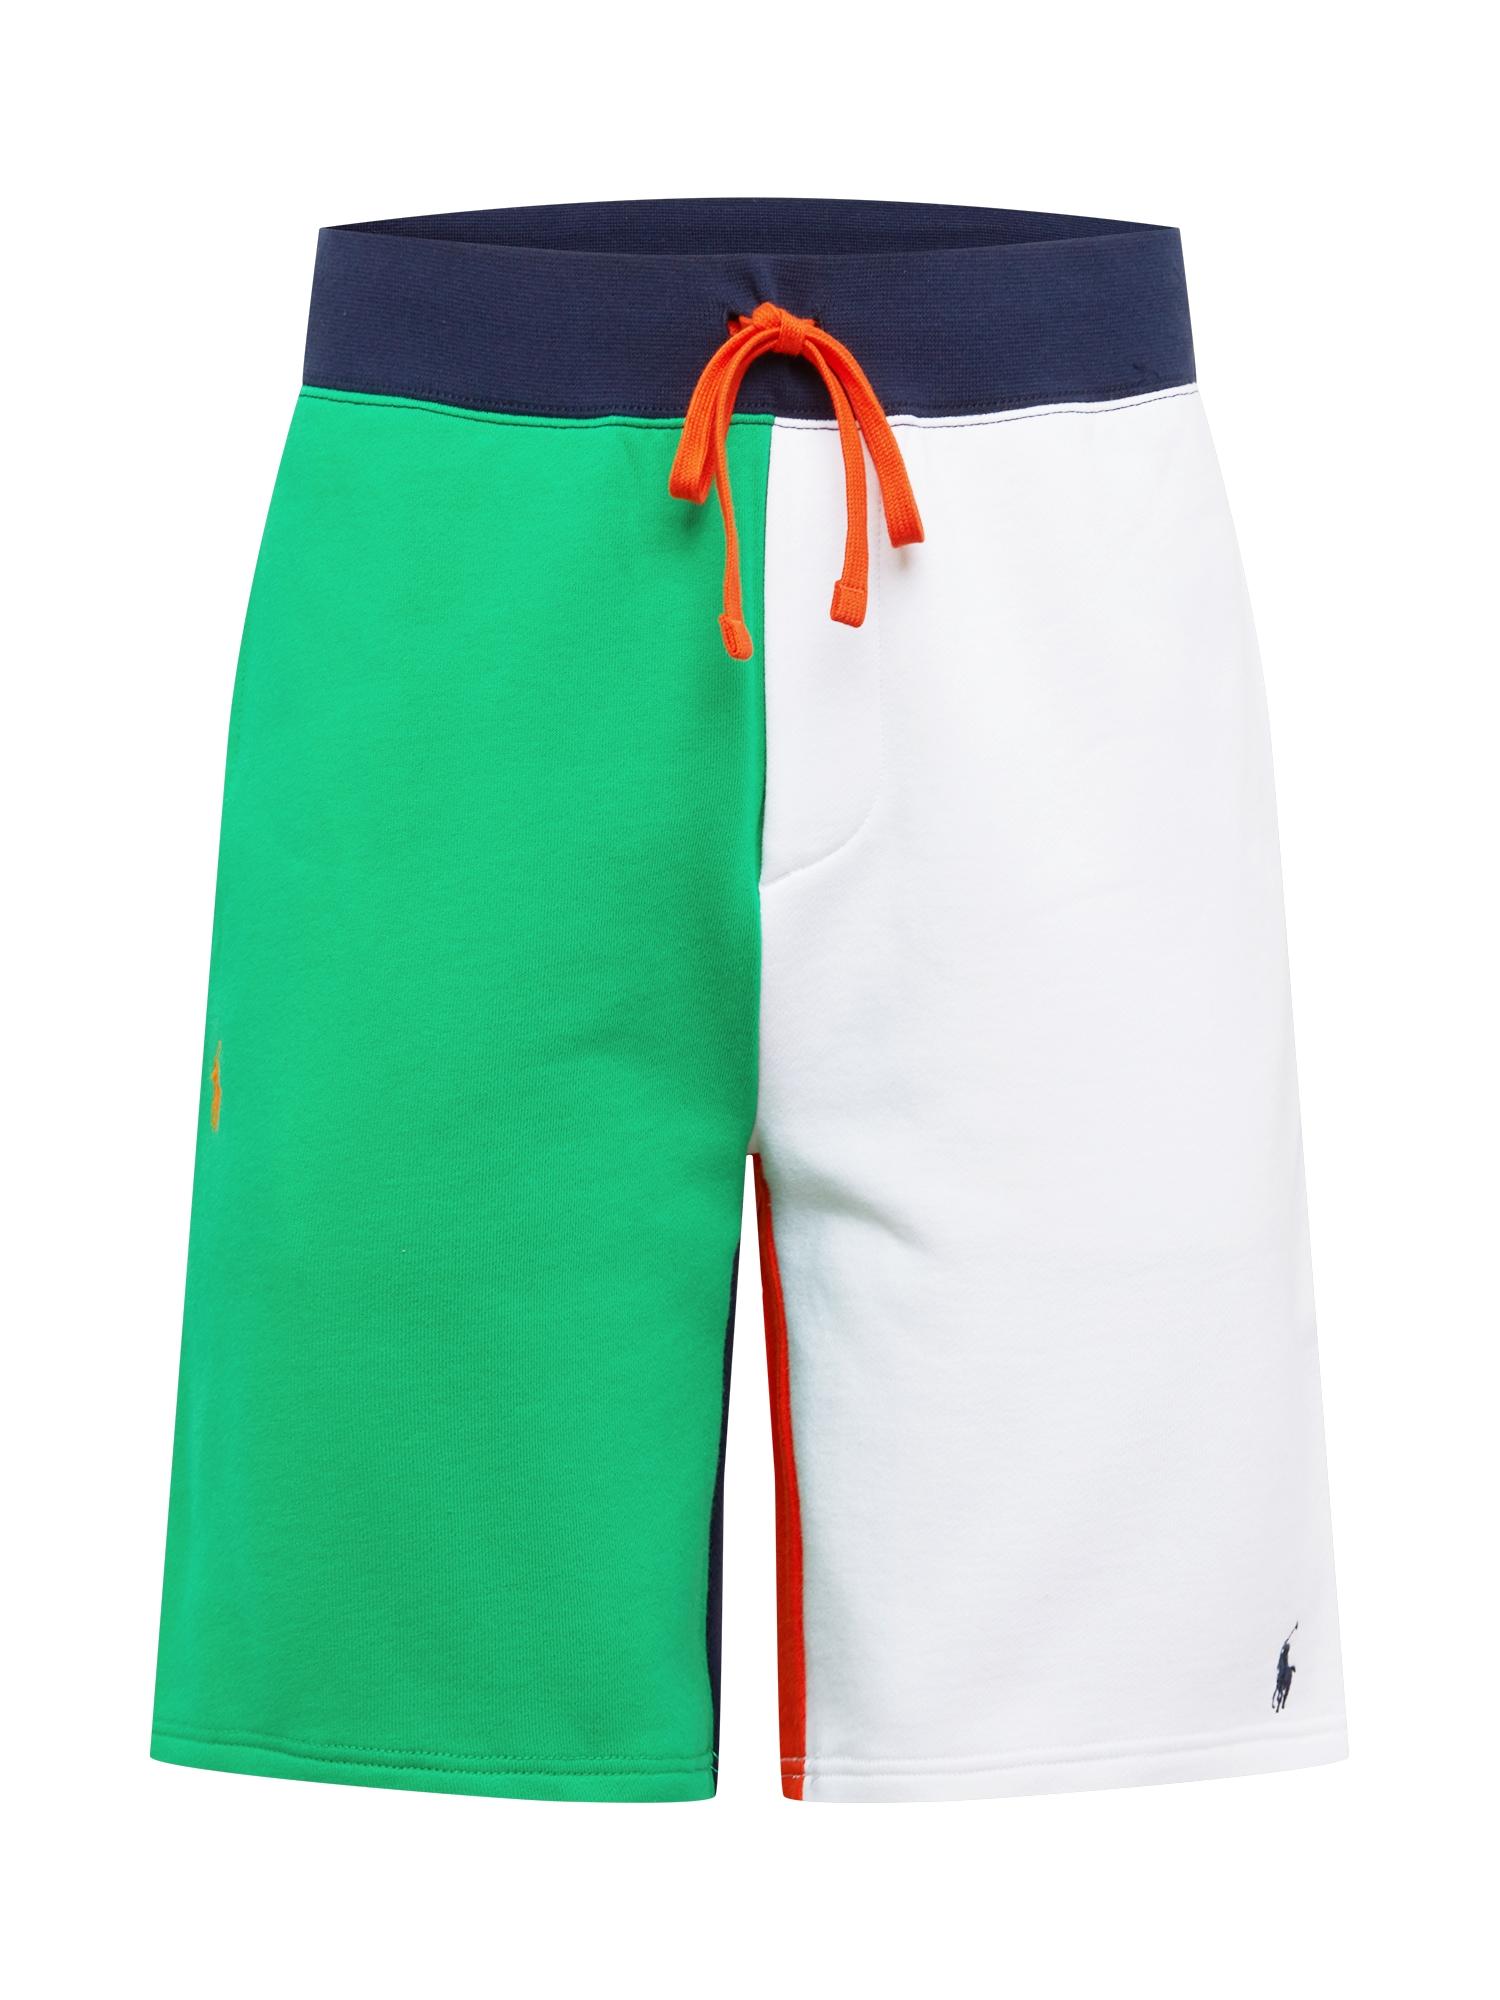 POLO RALPH LAUREN Kelnės žalia / balta / oranžinė / tamsiai mėlyna / mėlyna